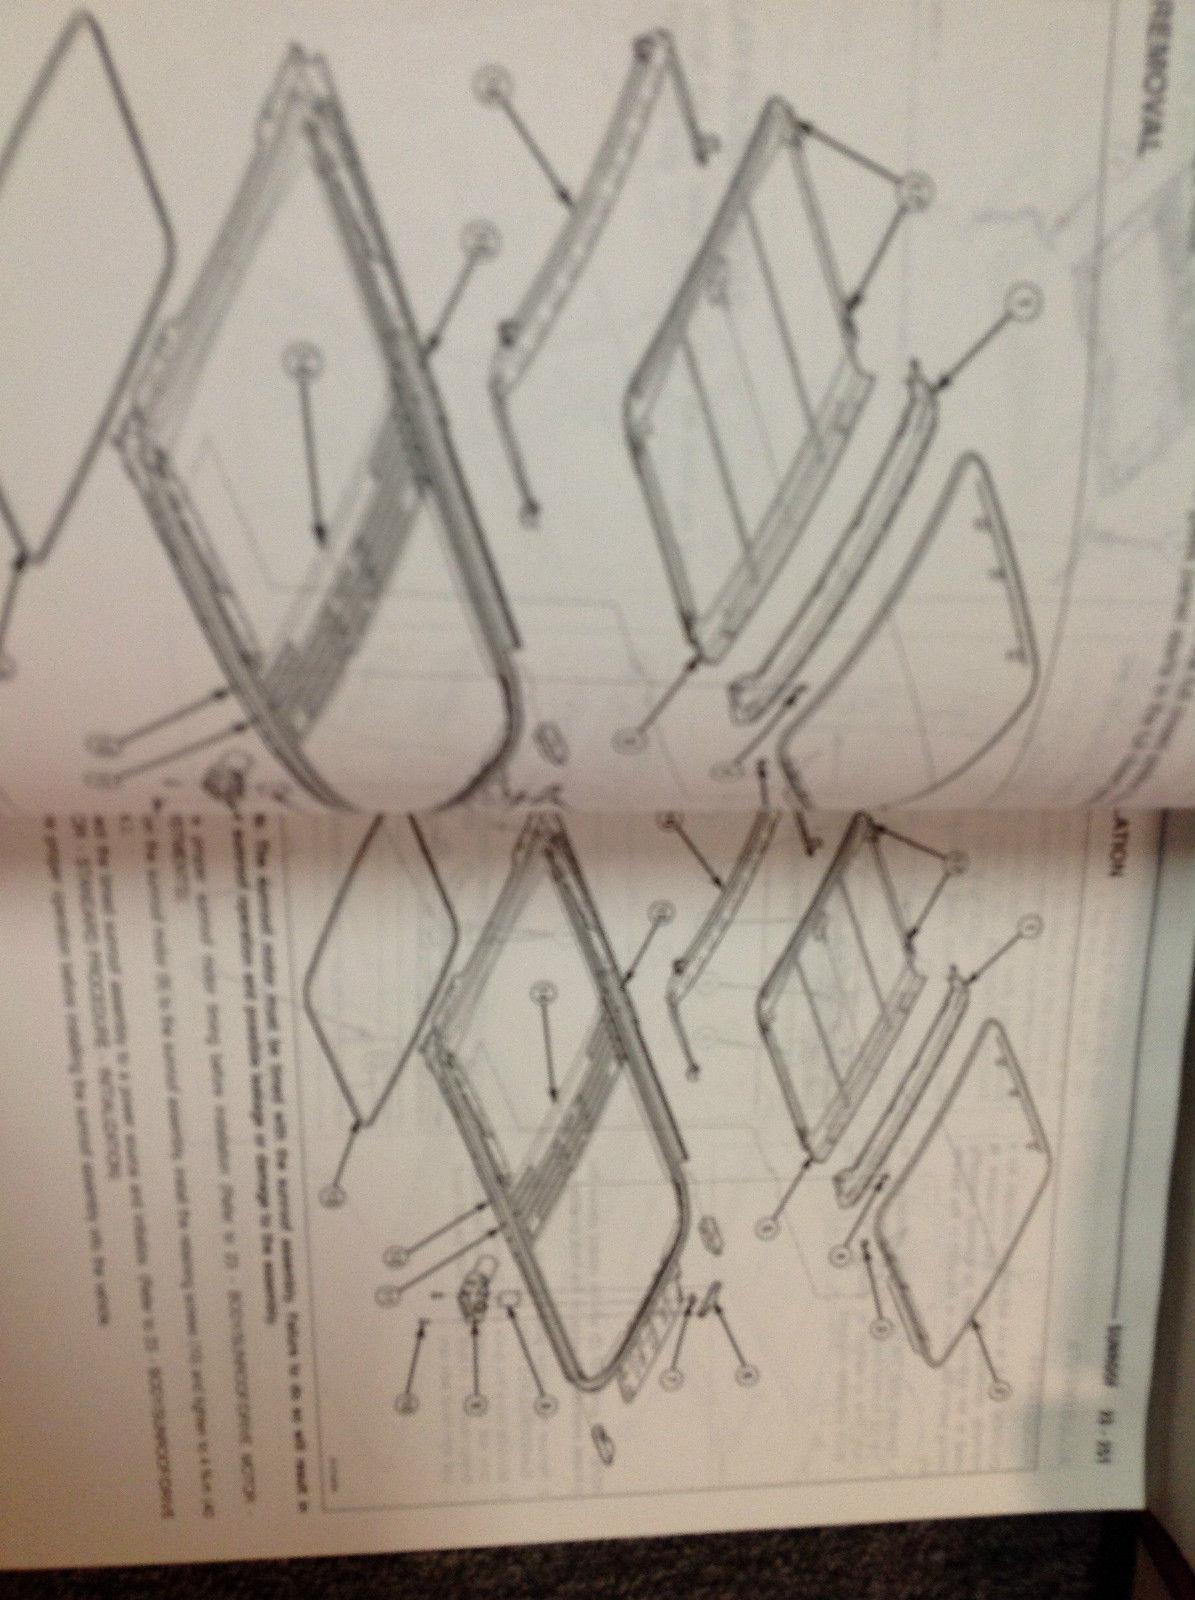 2007 DODGE DURANGO CHRYSLER ASPEN Service Shop Repair Manual Set W Labor Guide